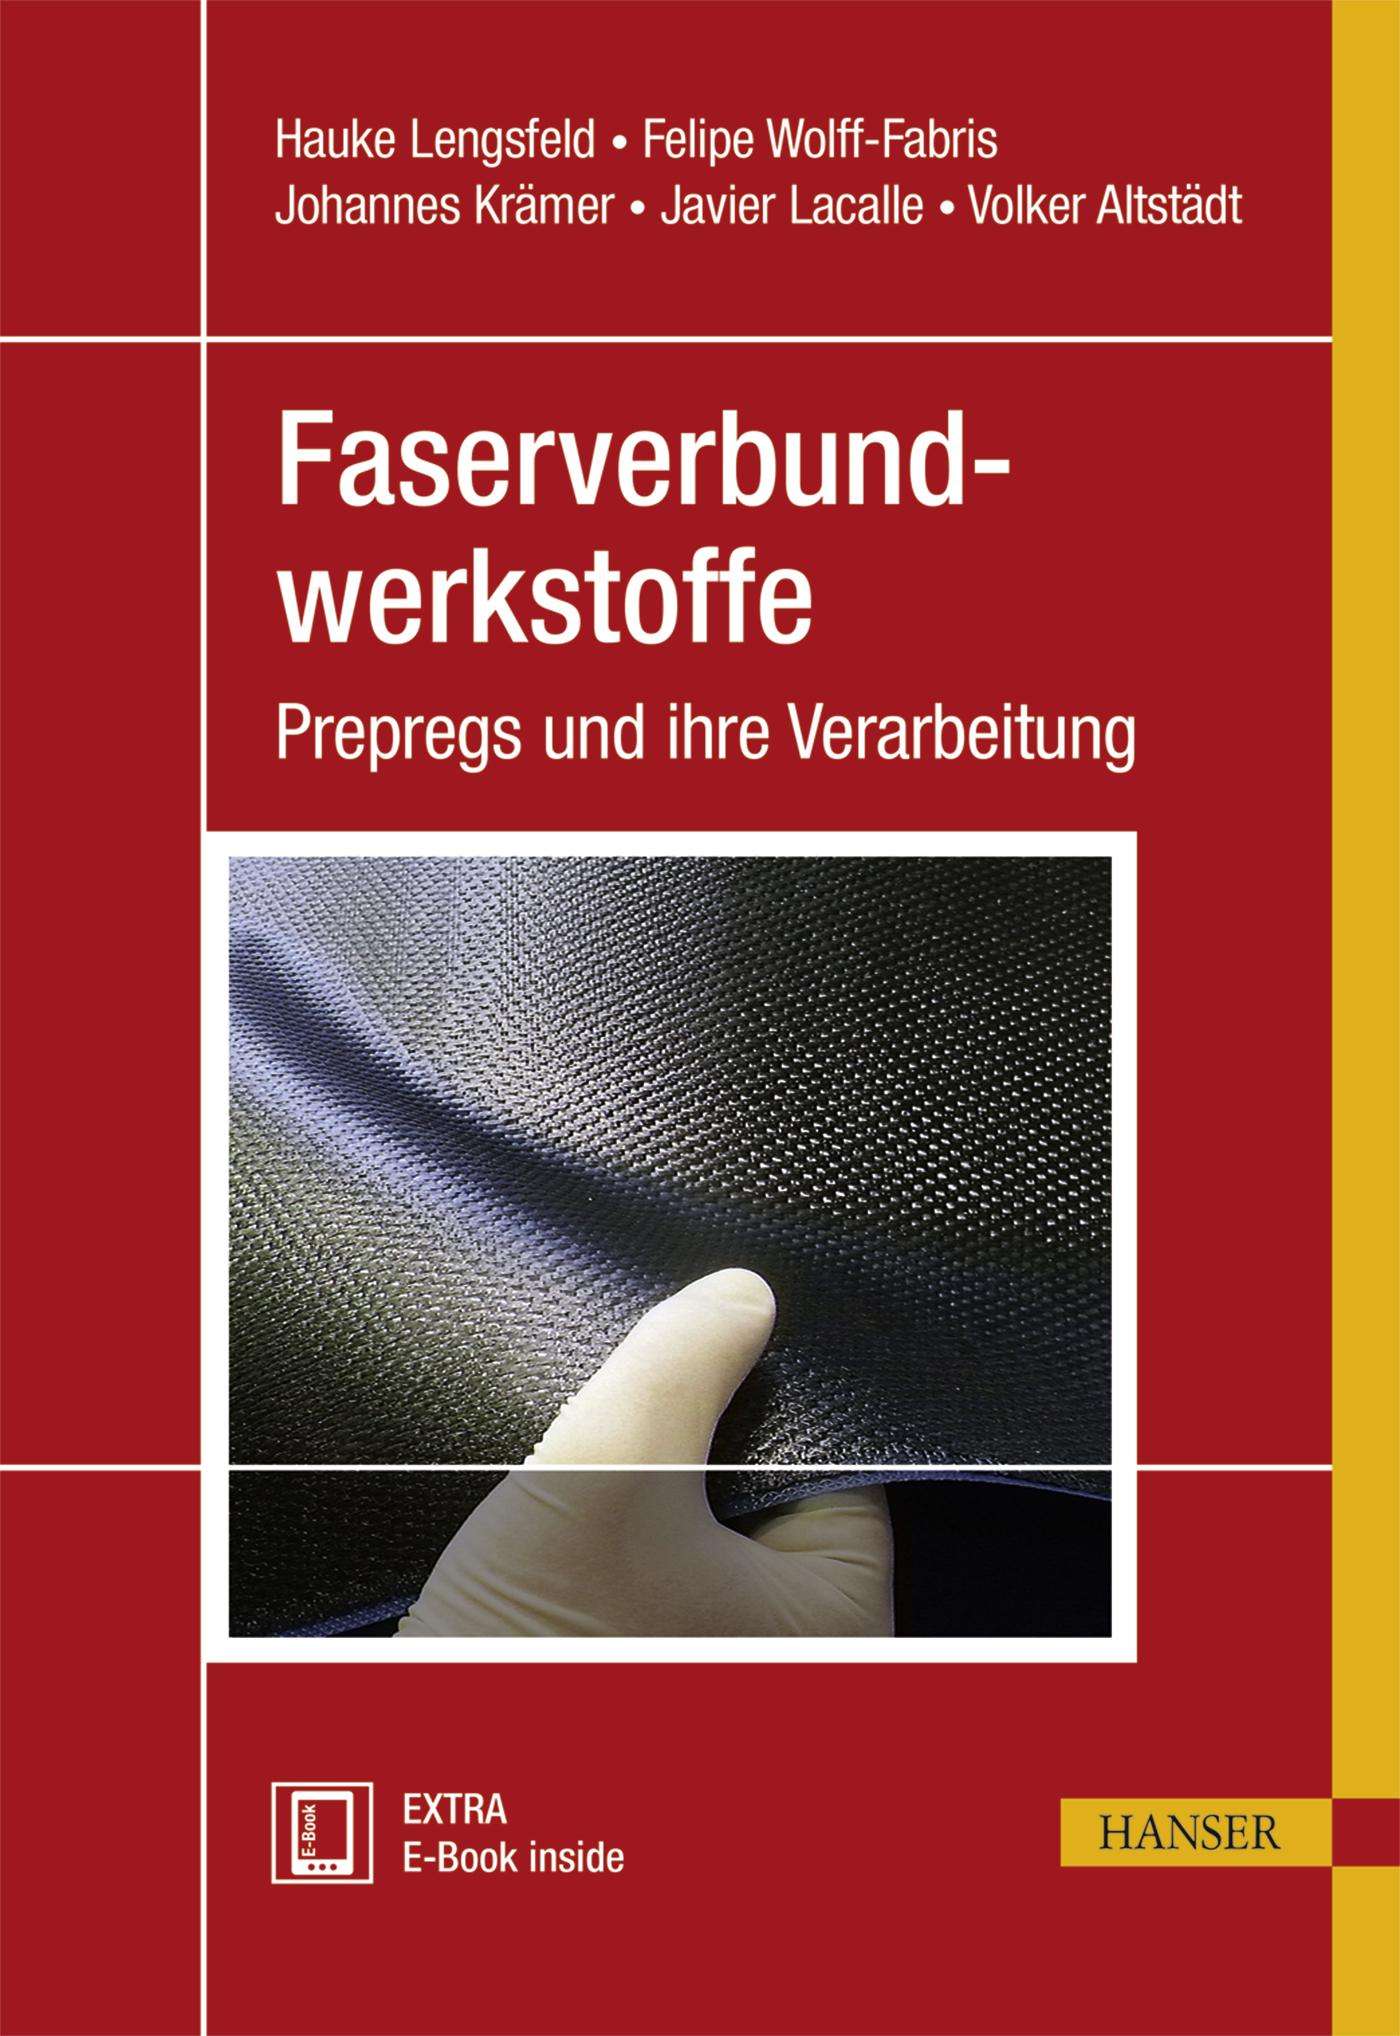 Lengsfeld, Wolff Fabris, Krämer, Lacalle, Altstädt, Faserverbundwerkstoffe, 978-3-446-43300-7